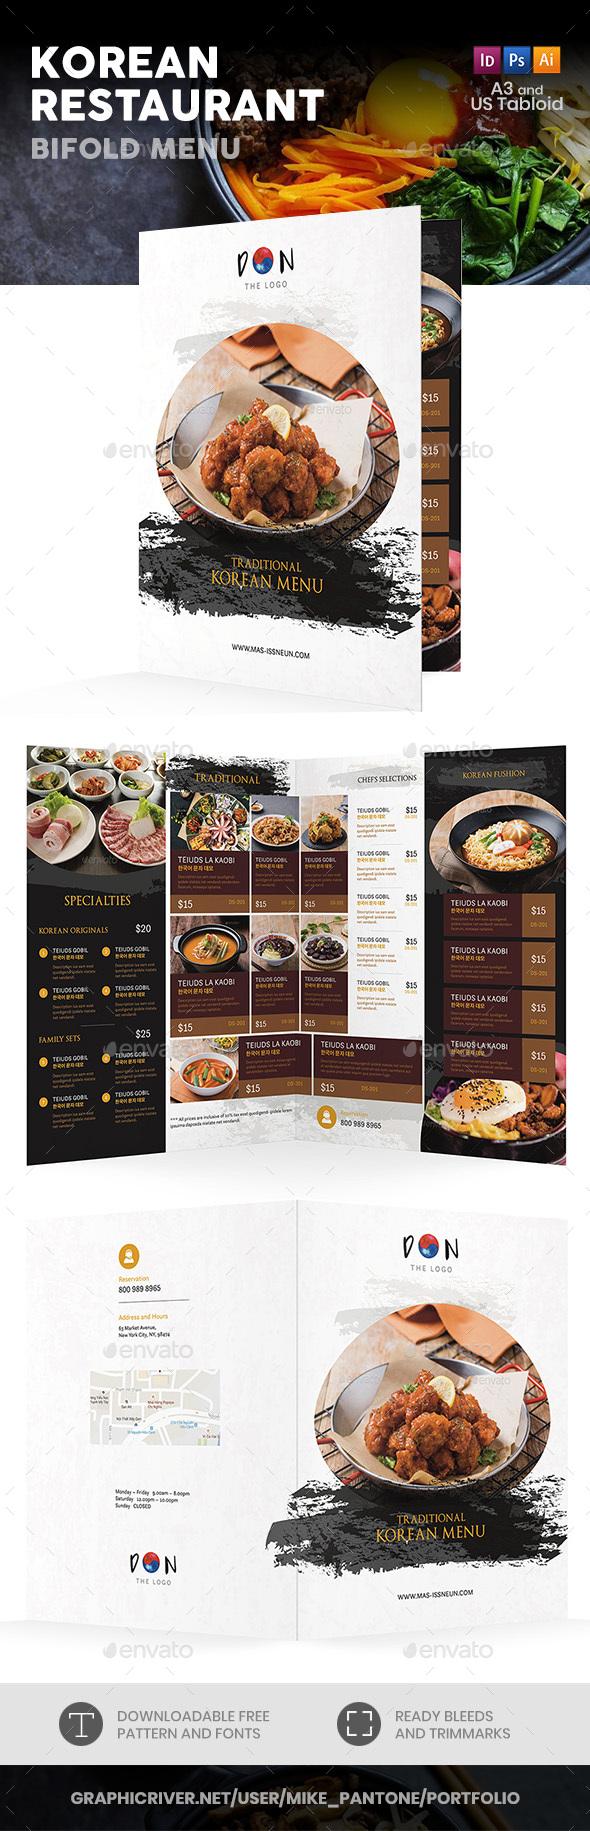 Korean Restaurant Bifold / Halffold Brochure 2 - Food Menus Print Templates